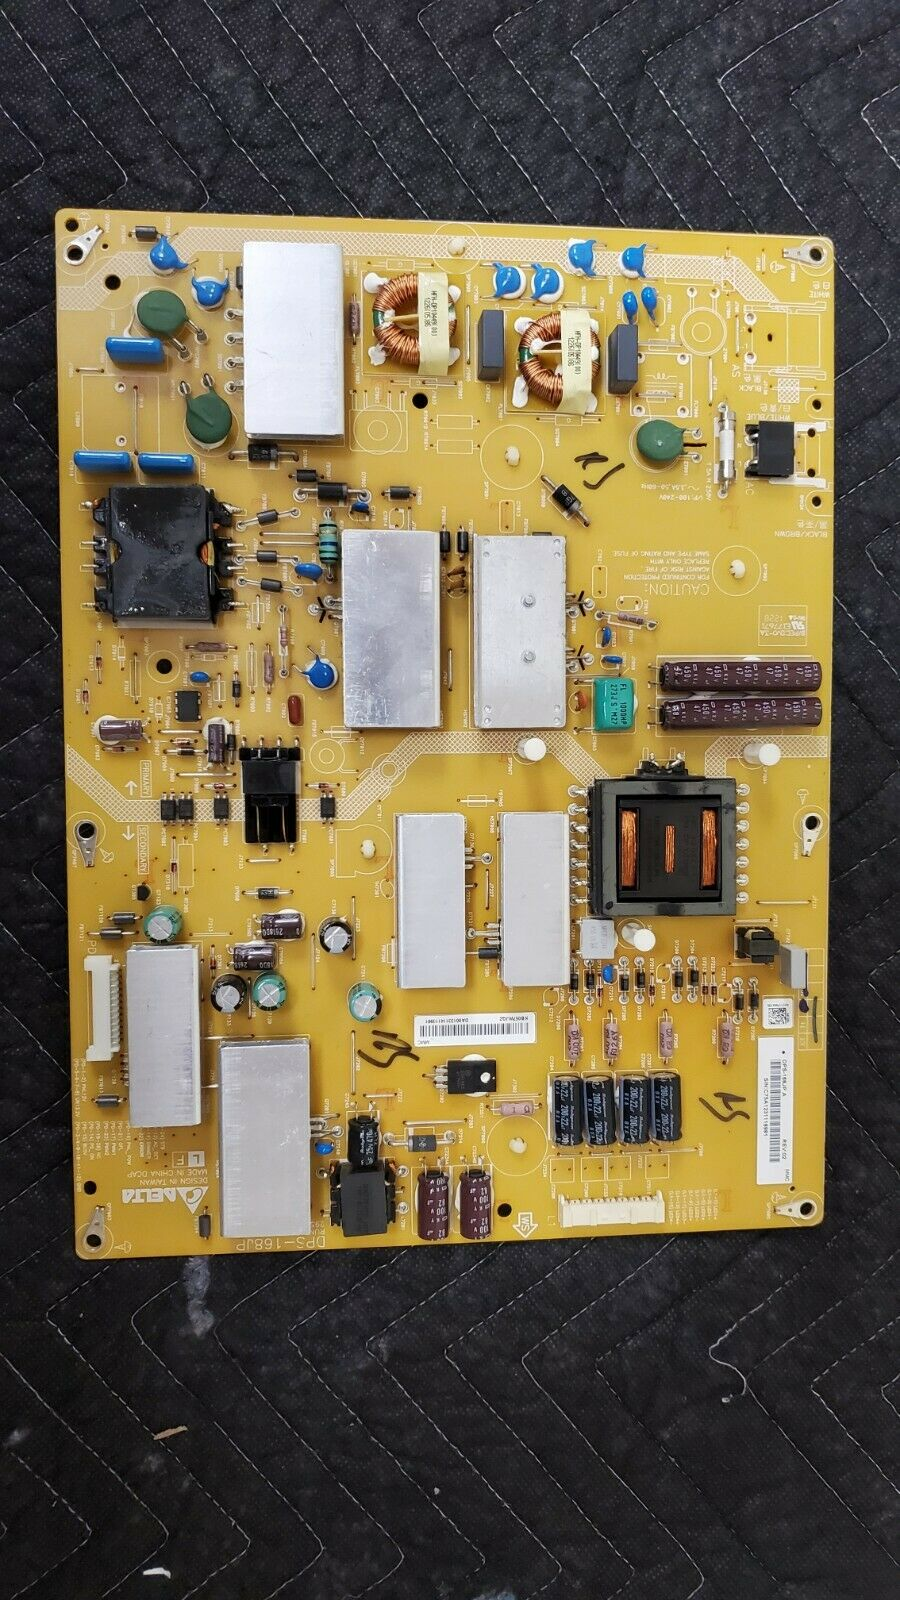 Pukido Original for Sharp LCD-46G100A power board JSI-461801A RUNTKA676WJQZ Plug Type: Universal